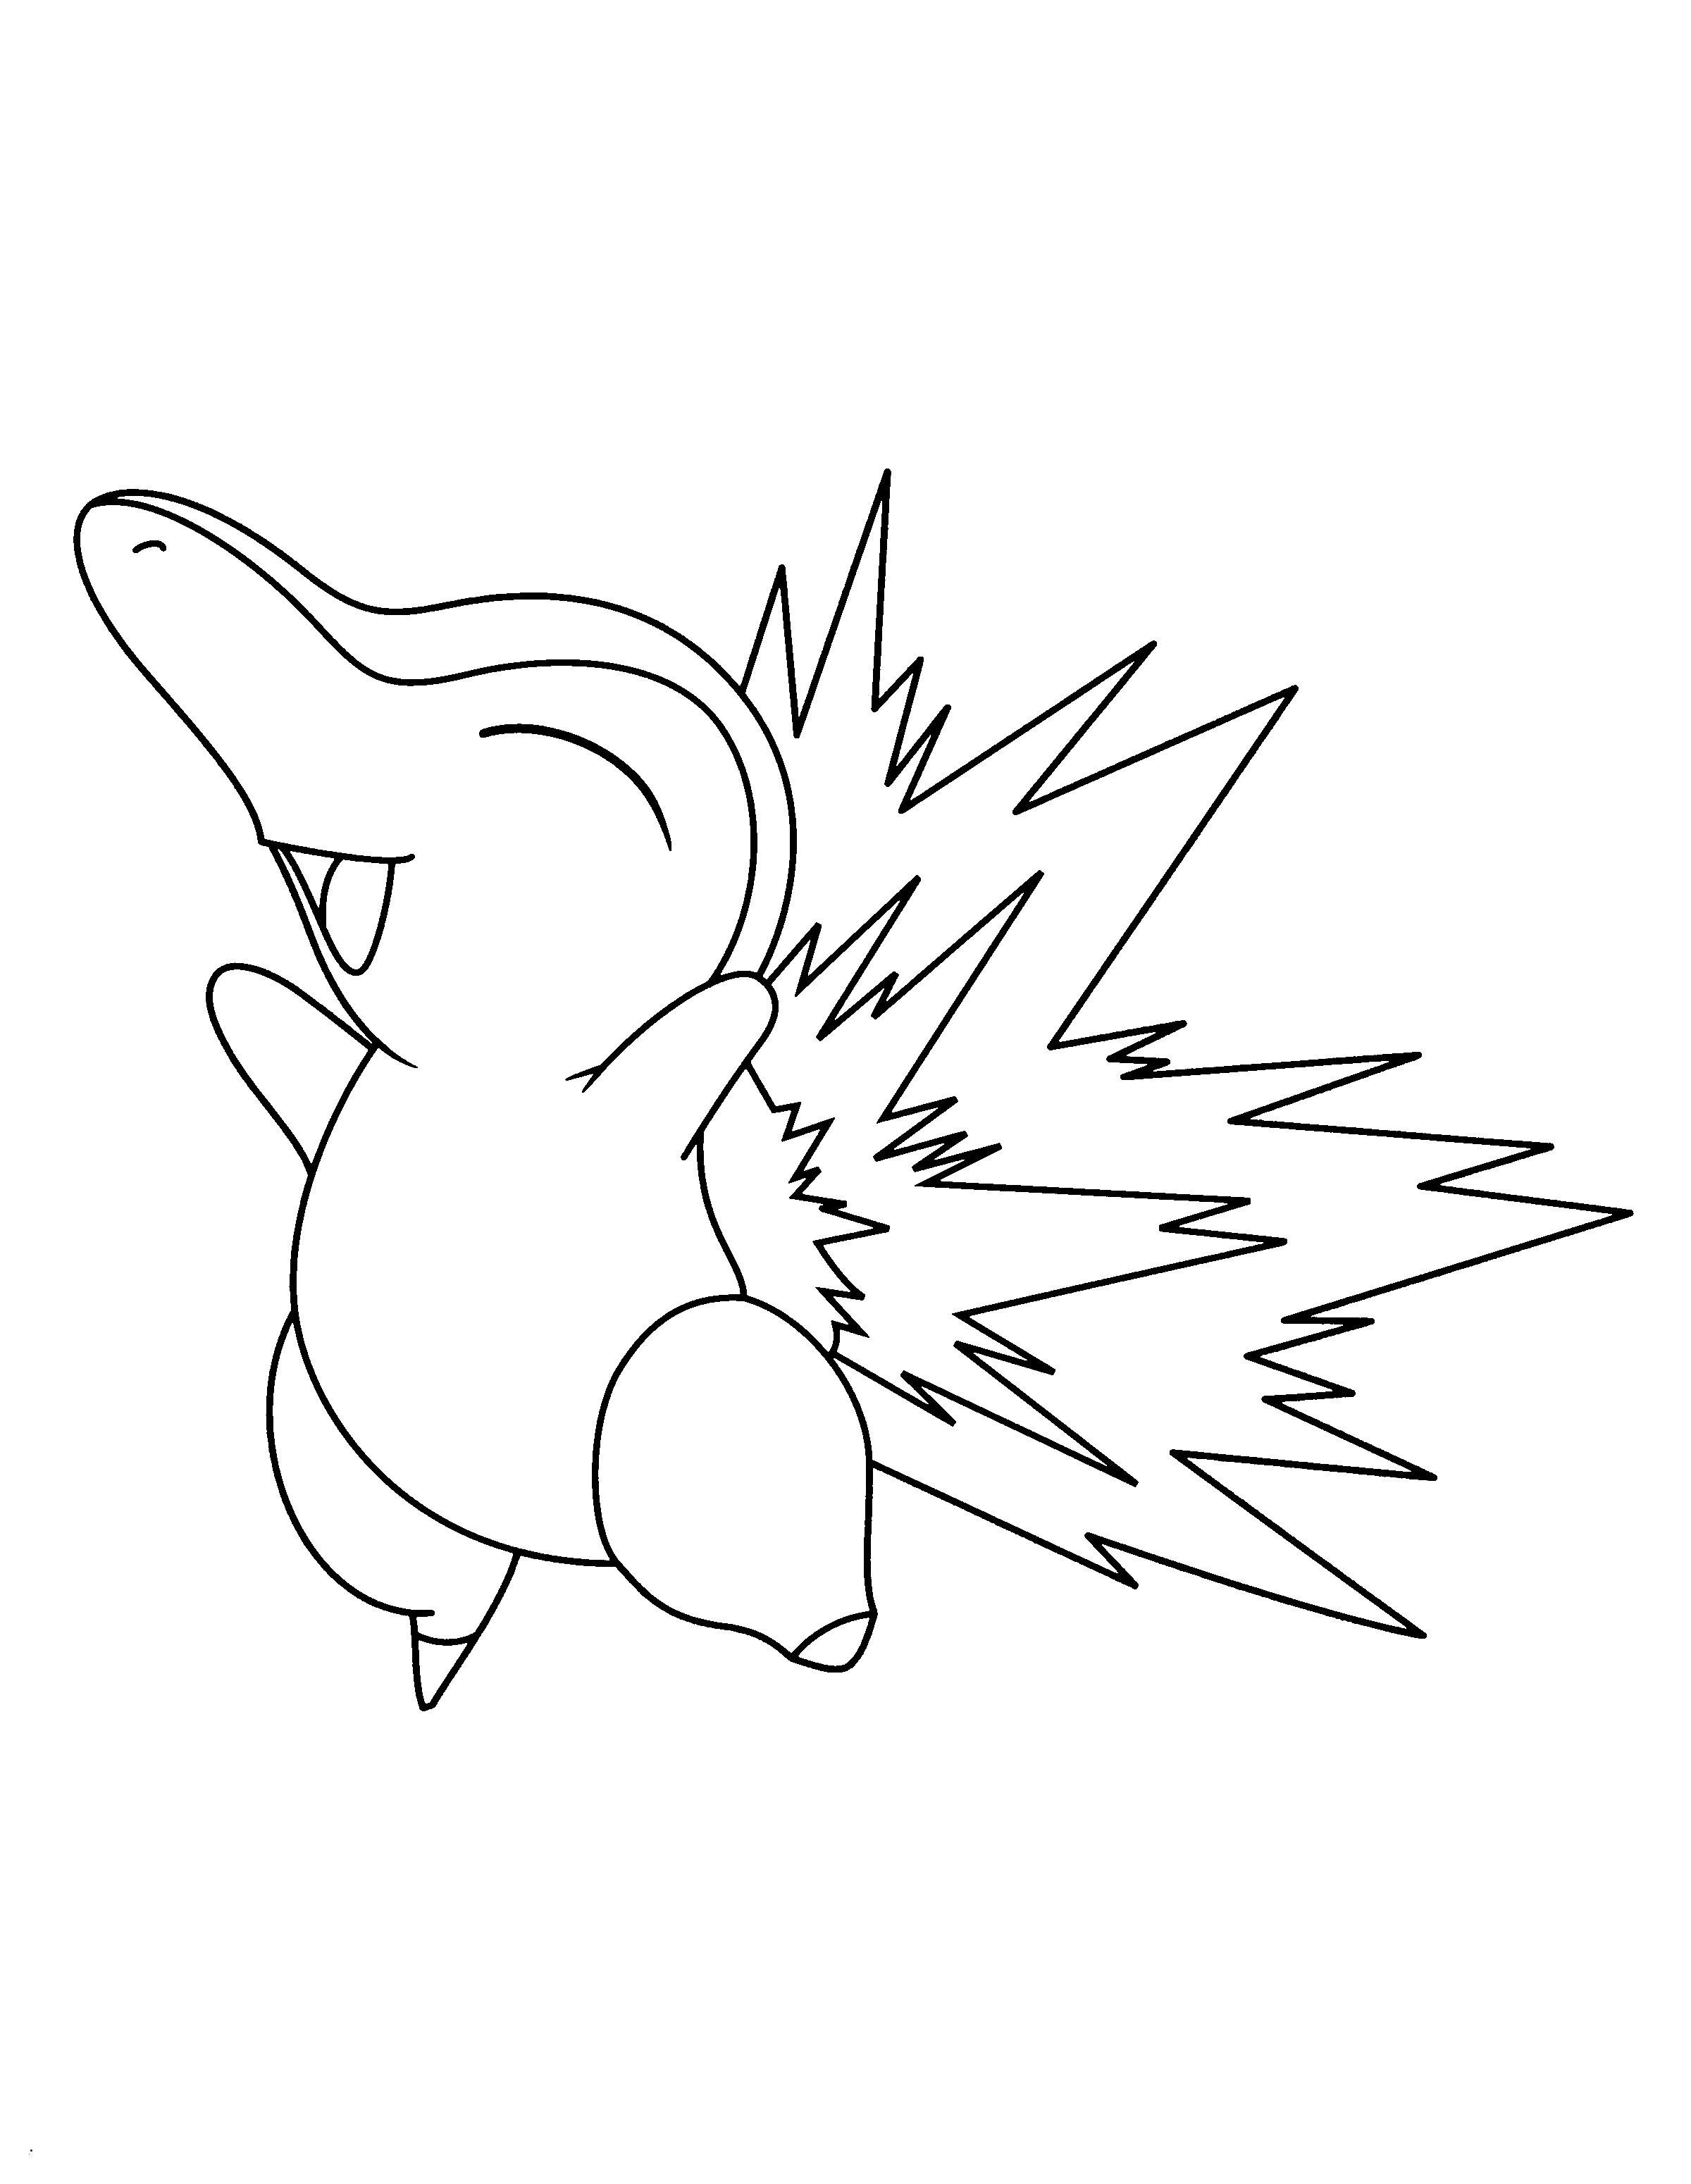 Pokemon Ausmalbilder Kostenlos Genial 48 Skizze Pokemon Ausmalbilder Zum Drucken Treehouse Nyc Galerie